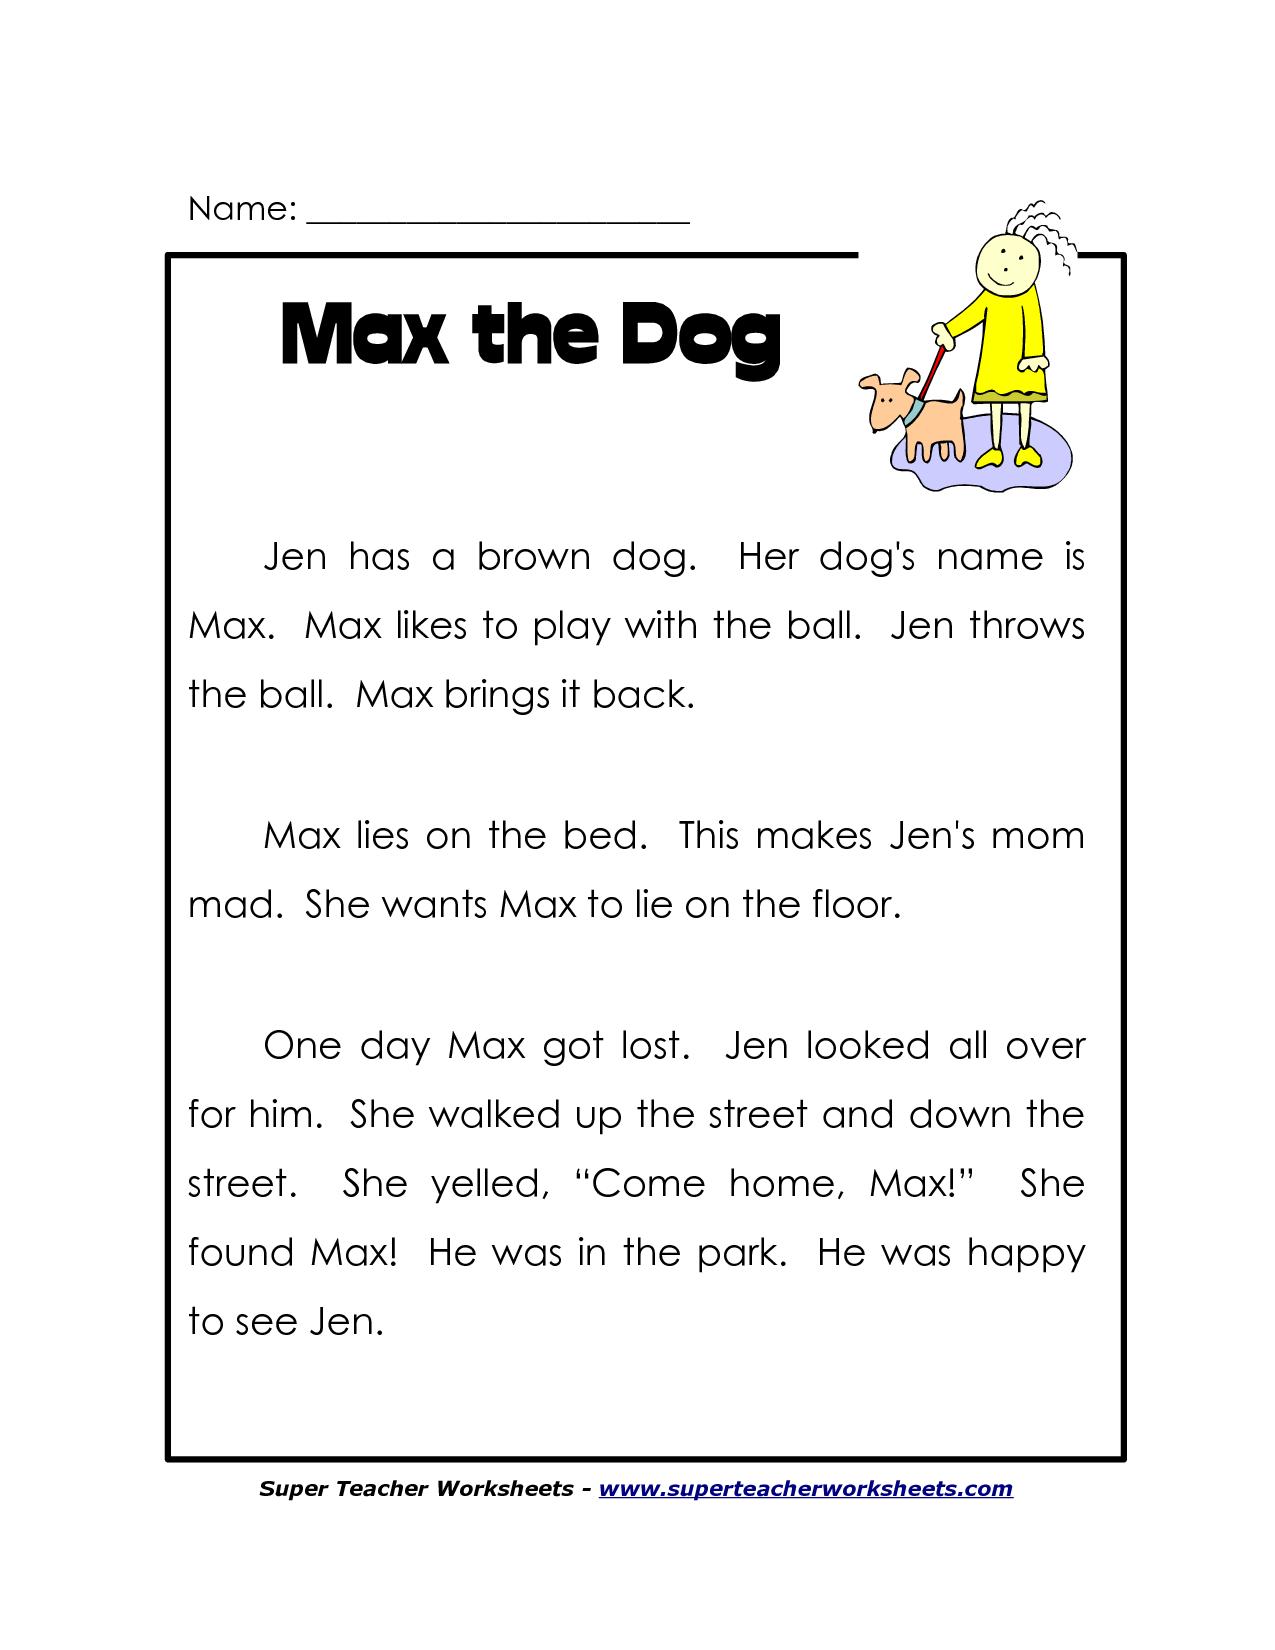 Image Result For Practice Reading For Grade 1 1st Grade Reading Worksheets Reading Worksheets First Grade Reading Comprehension [ 1650 x 1275 Pixel ]